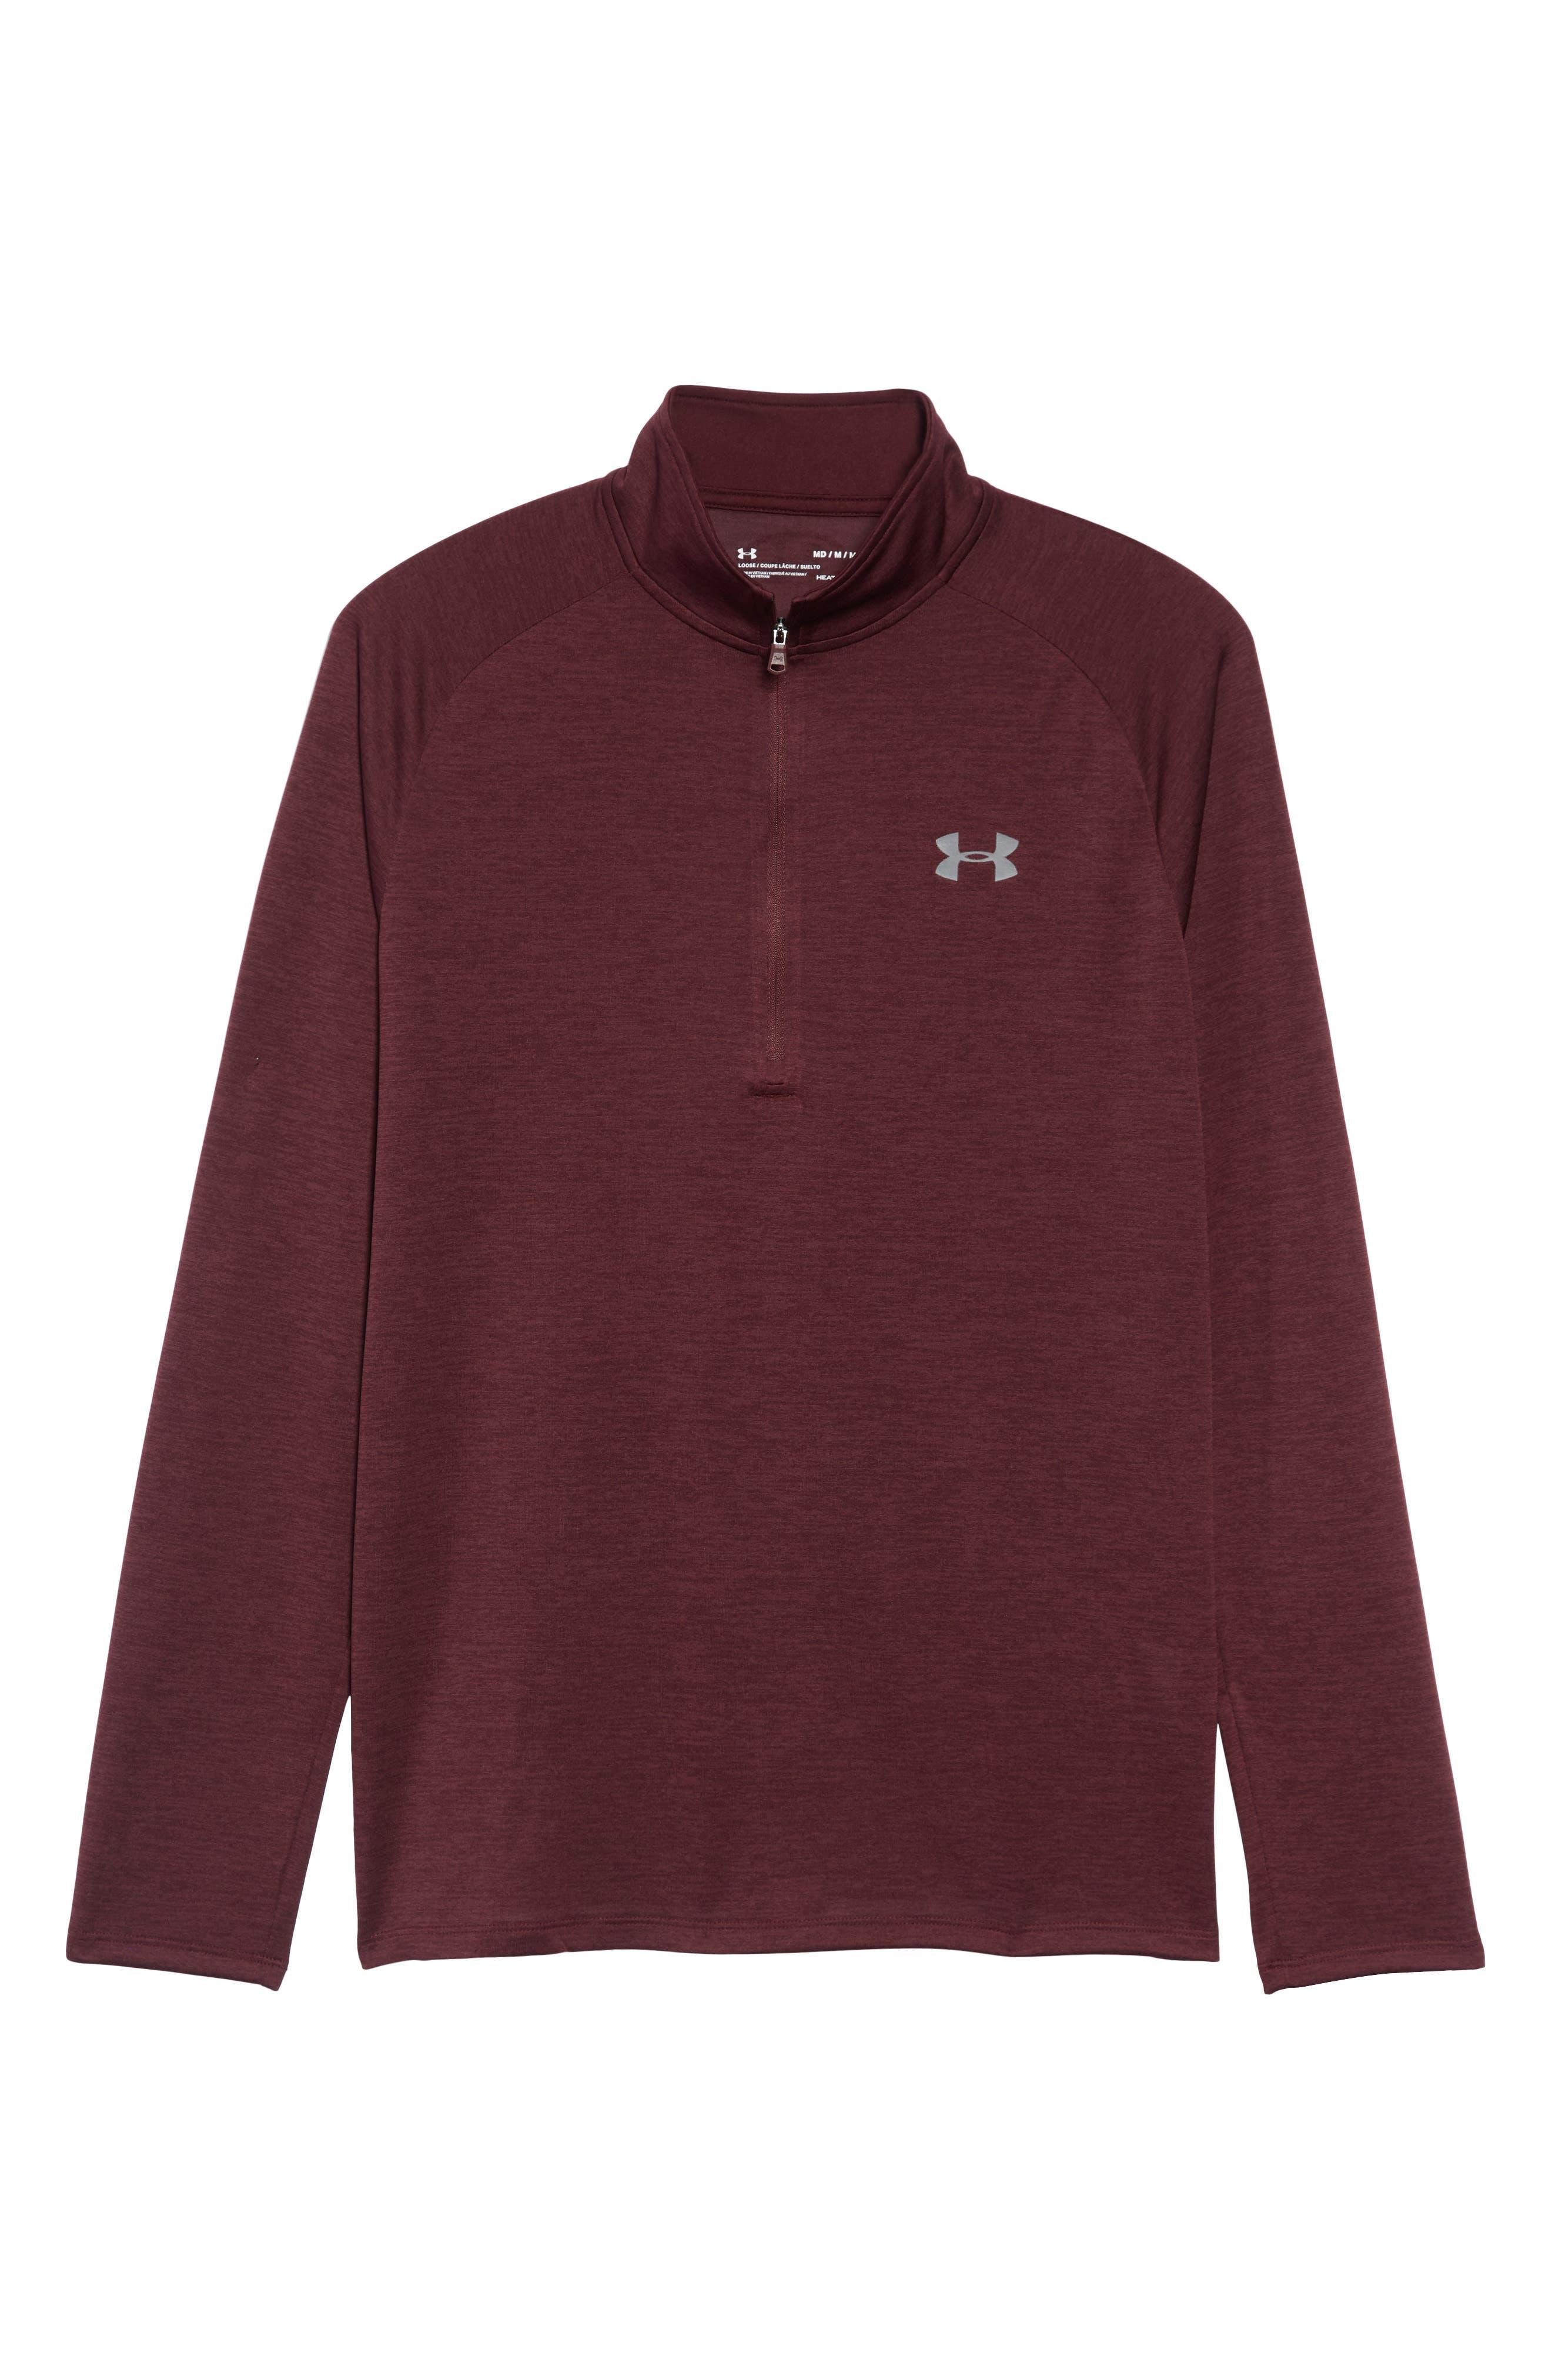 UNDER ARMOUR,                             Tech Half Zip Sweatshirt,                             Alternate thumbnail 6, color,                             600